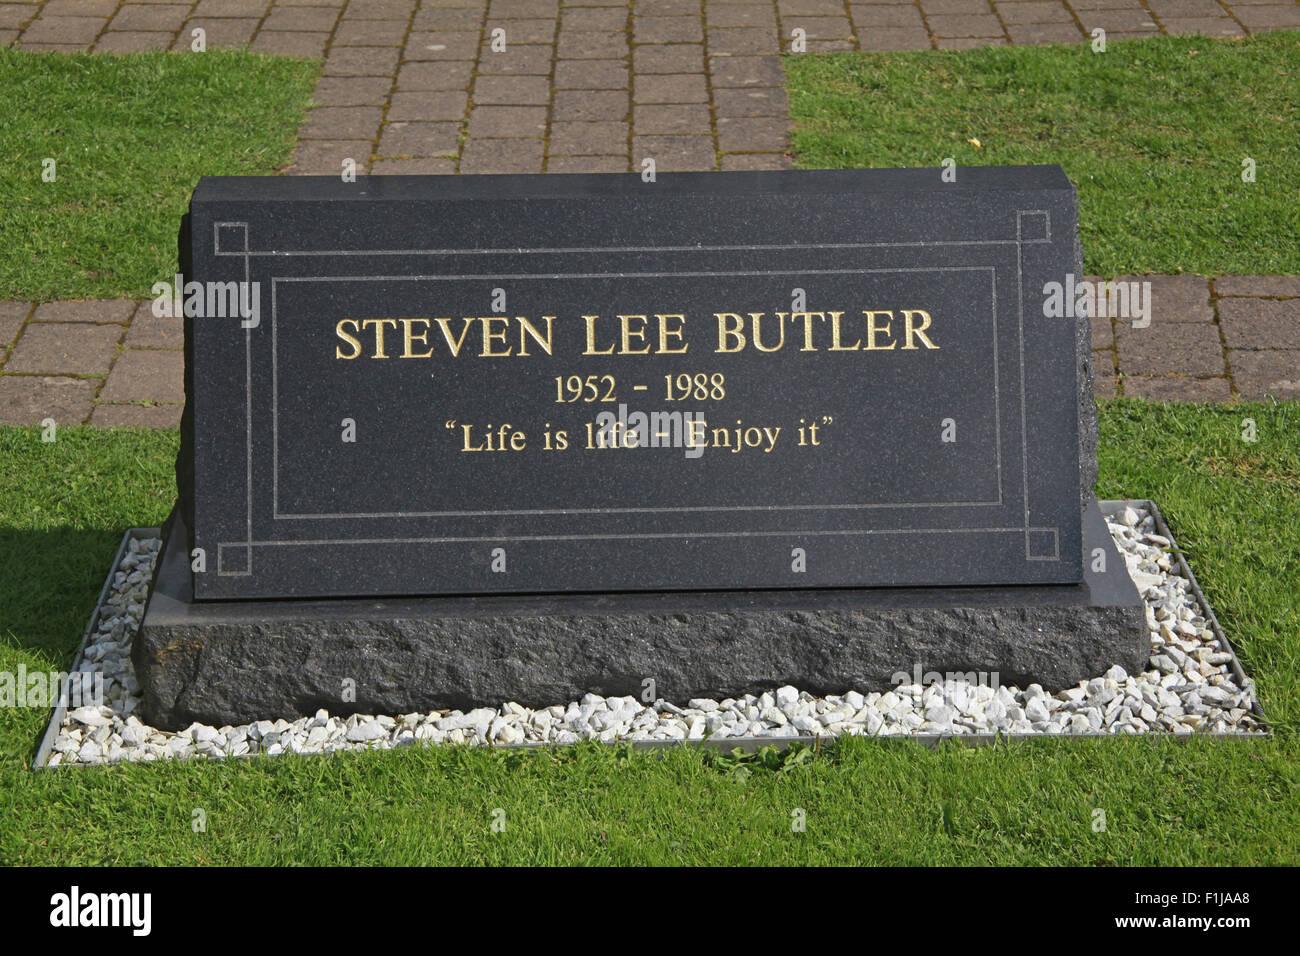 Lockerbie PanAm103 Memorial Steven Lee Butler, Scotland Stock Photo